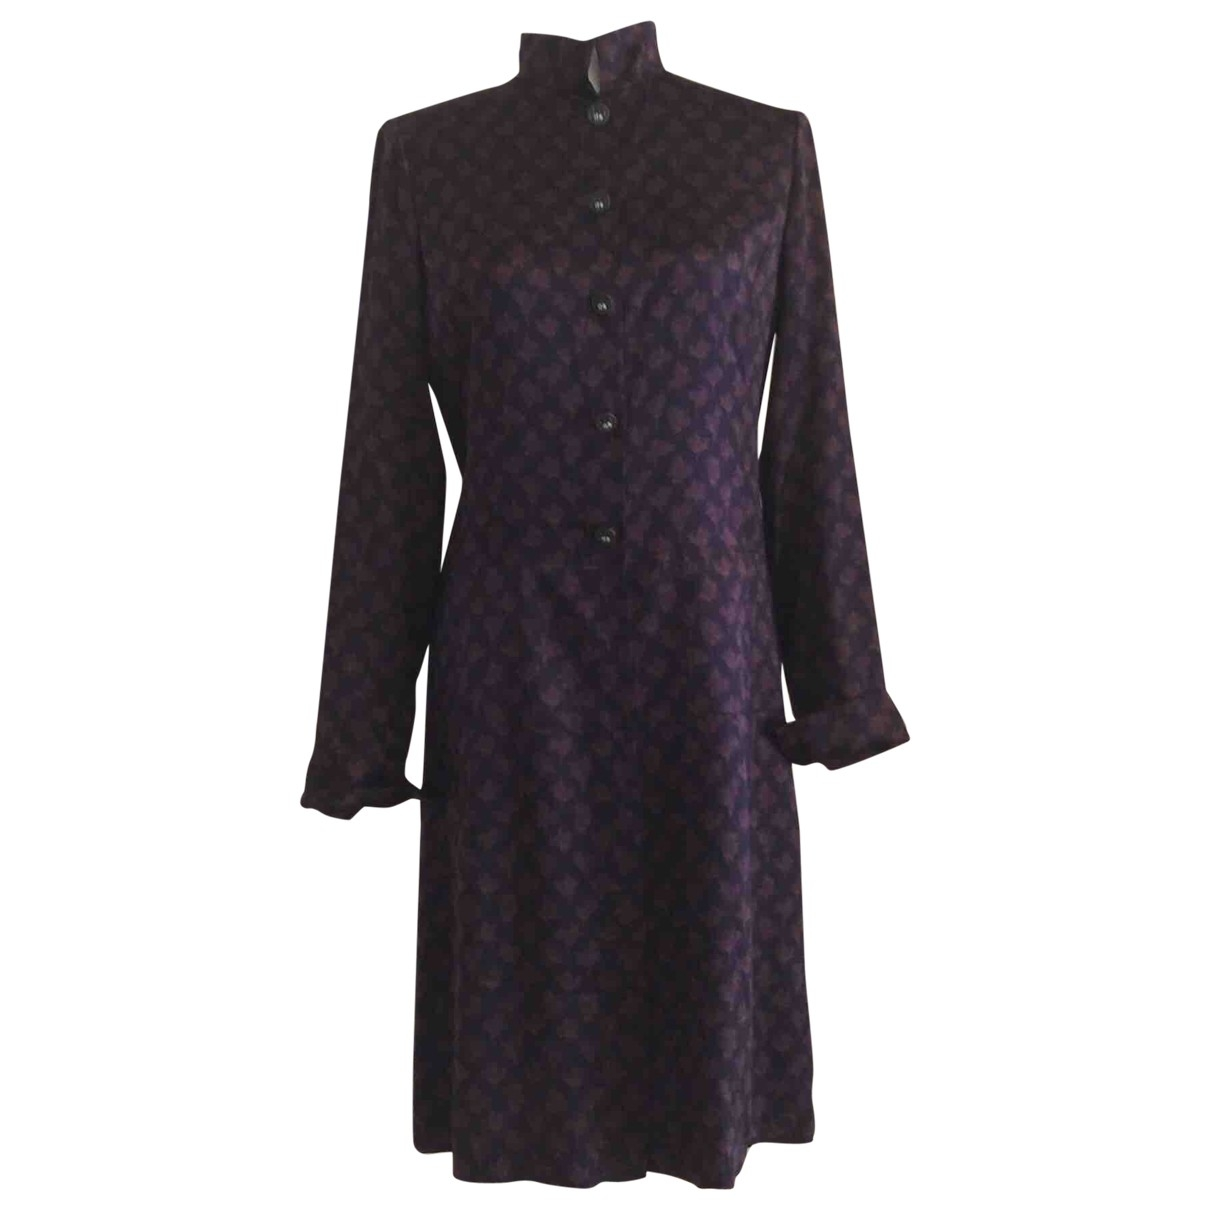 Chanel \N Kleid in  Braun Seide